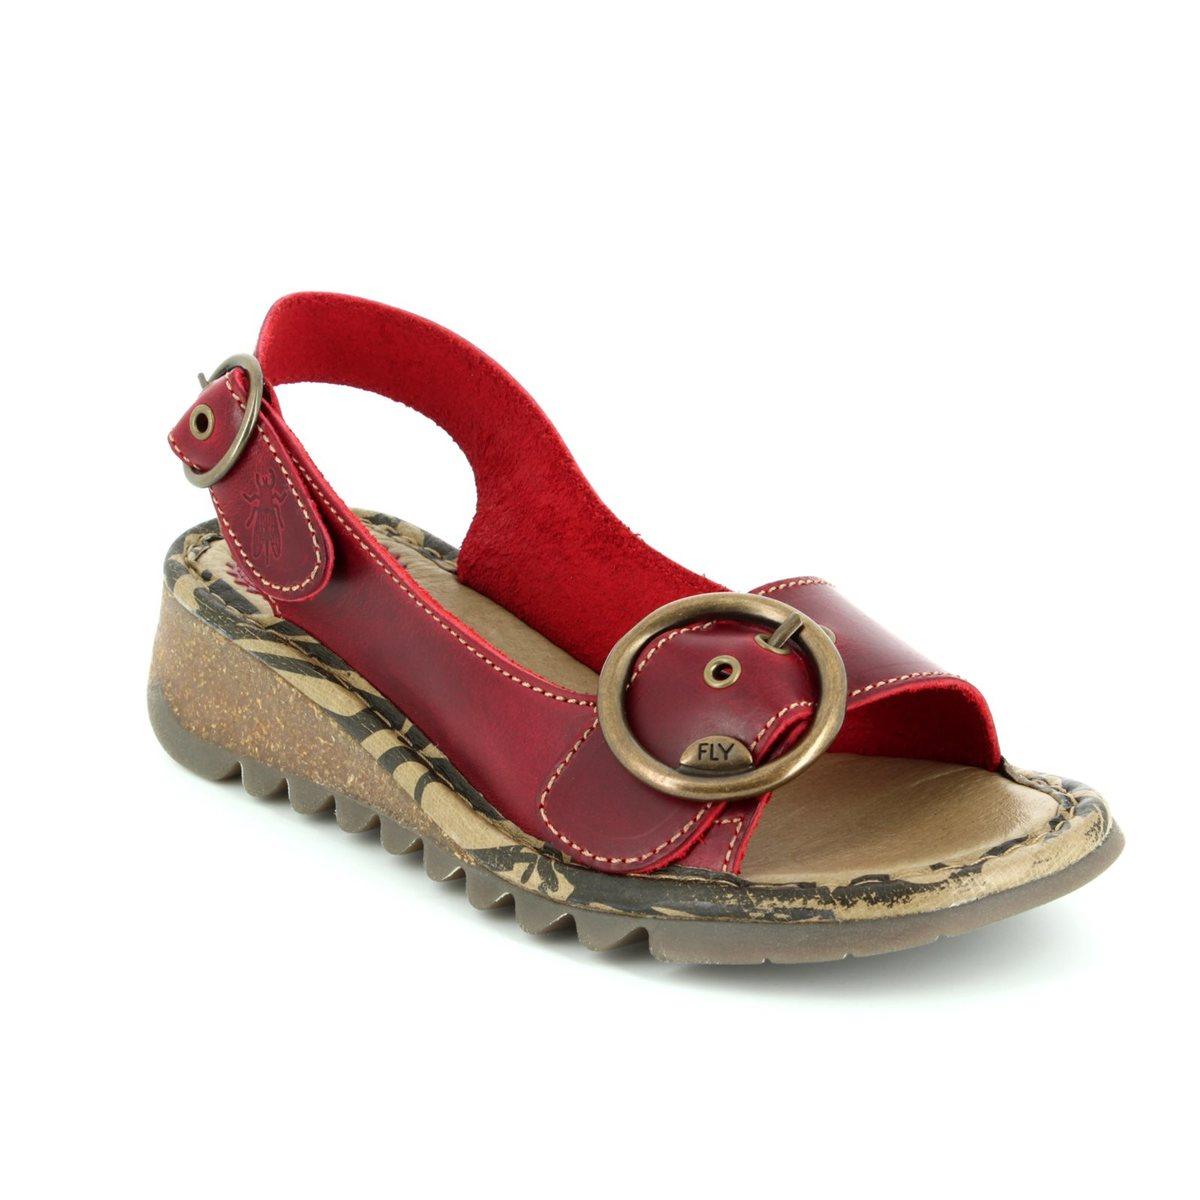 813168b45ec09 Fly London Sandals - Dark Red - P500723 TRAM